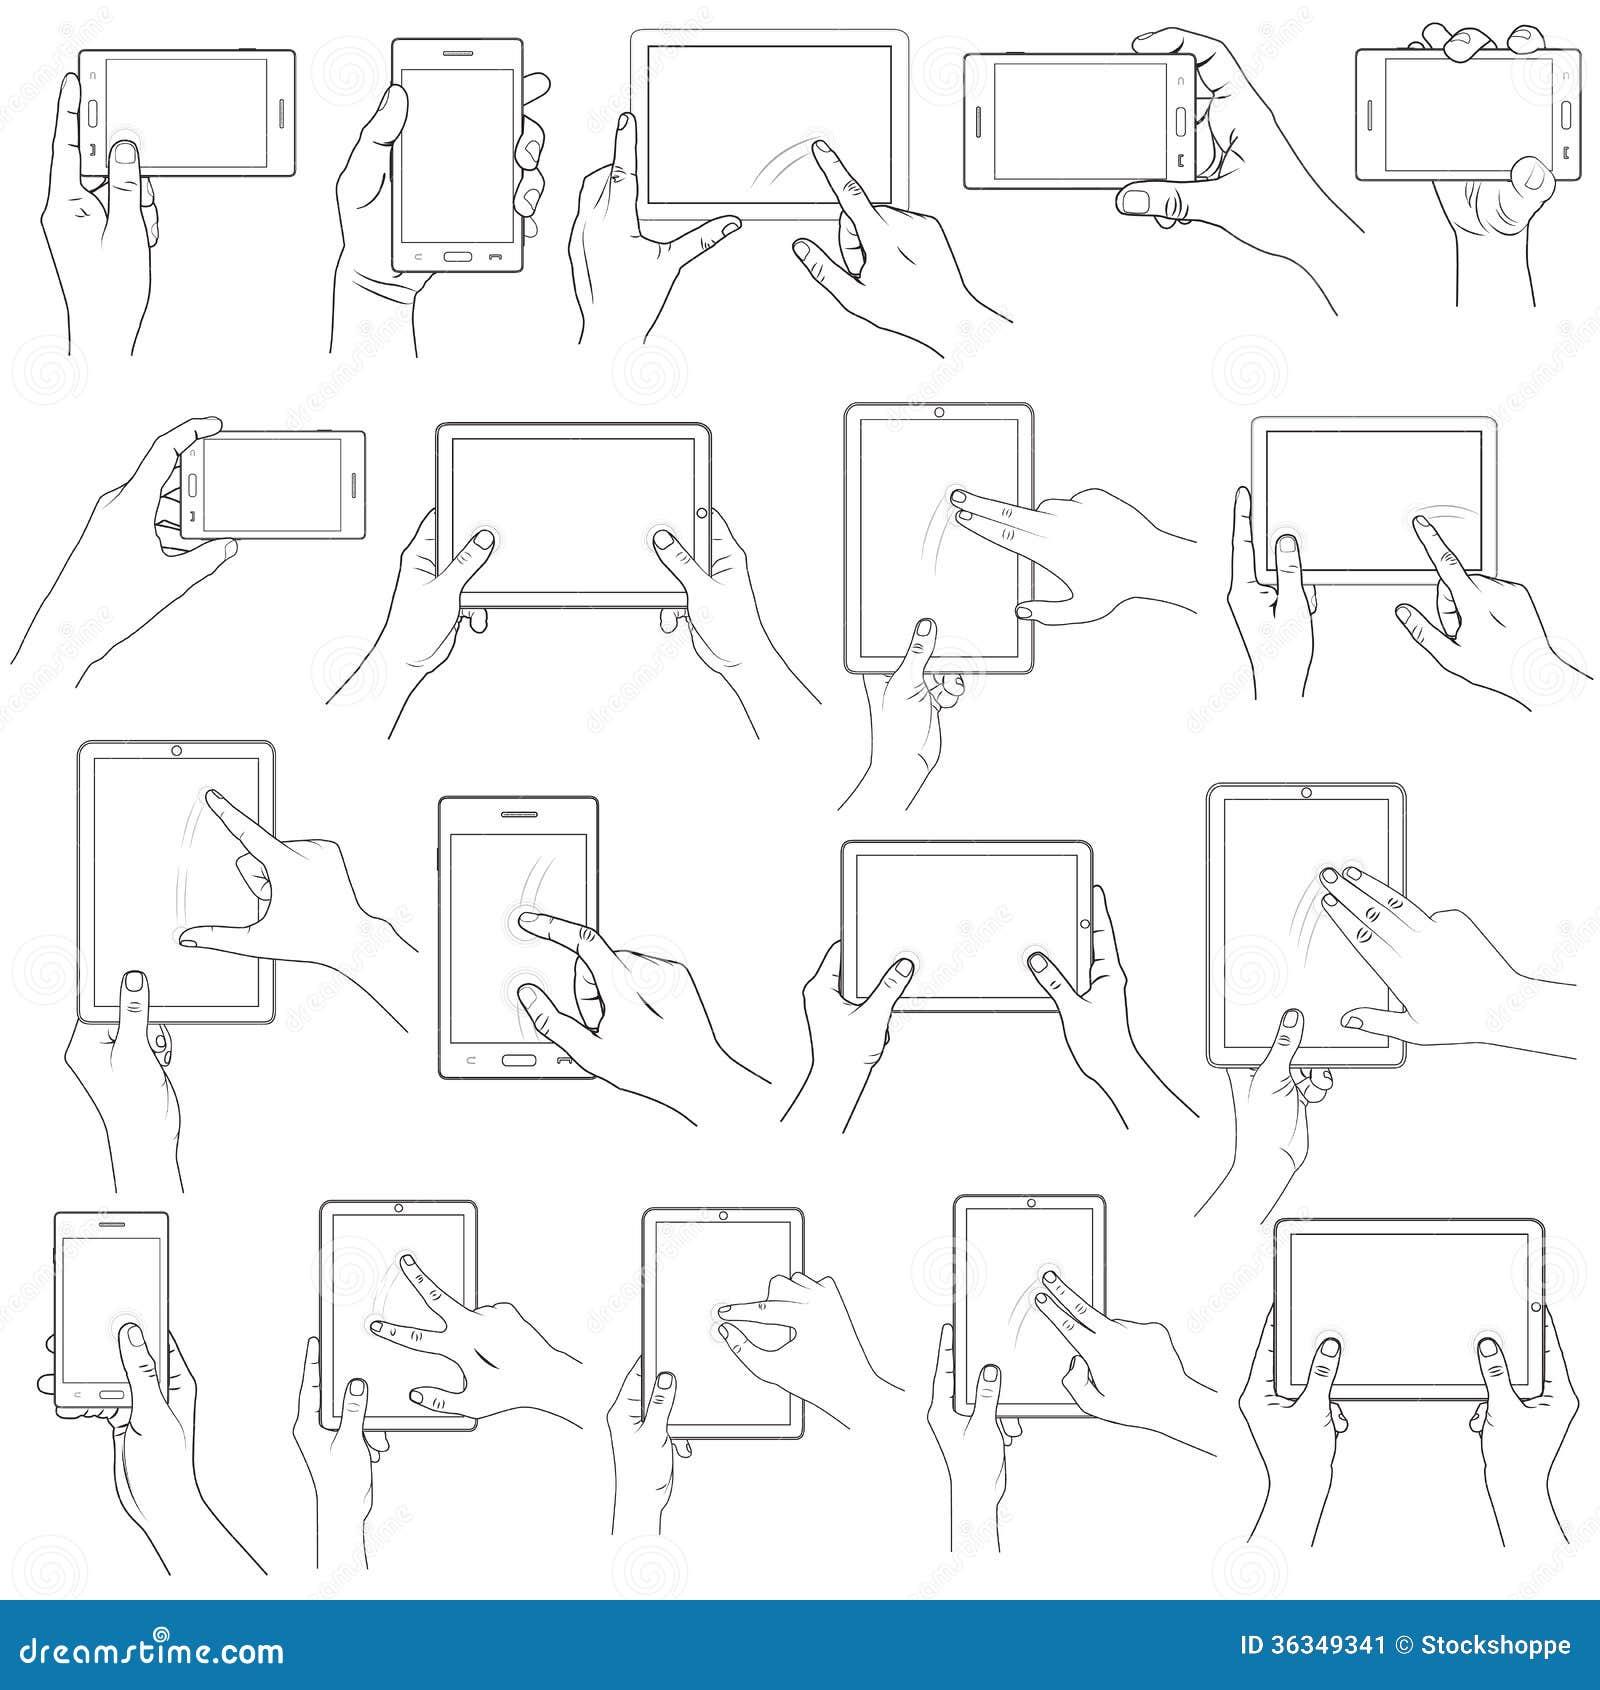 Handgest för pekskärm